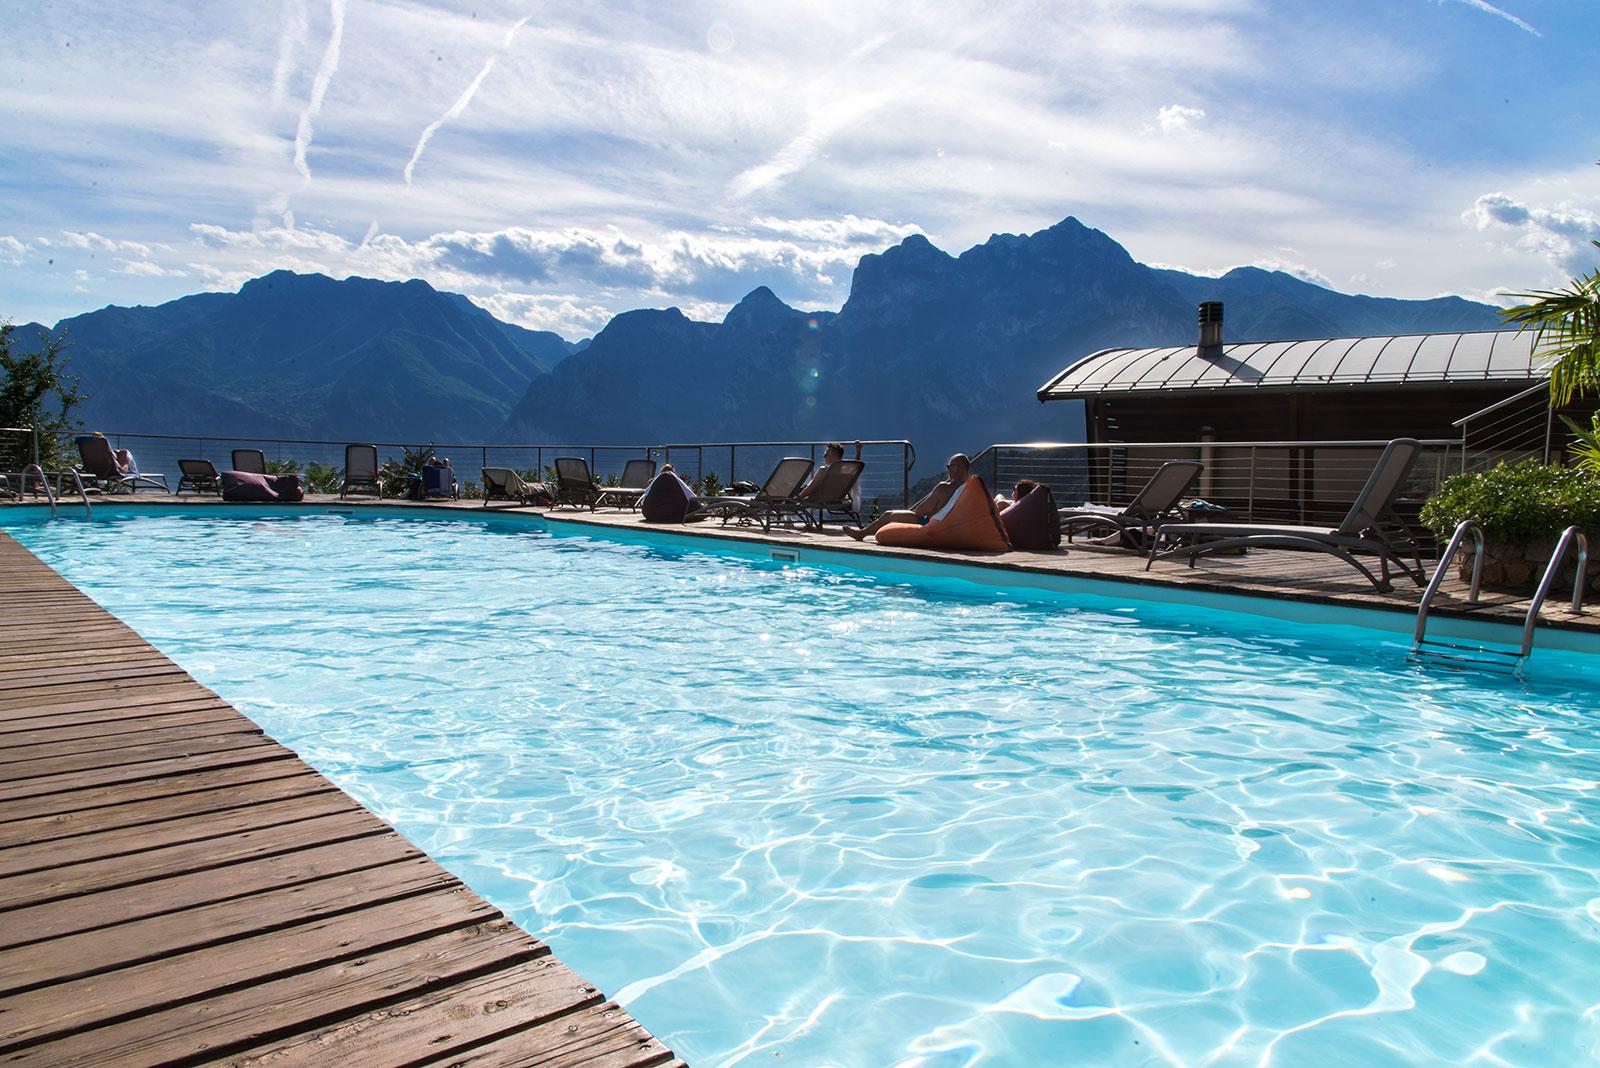 Jezioro Garda hotel Forte Charme